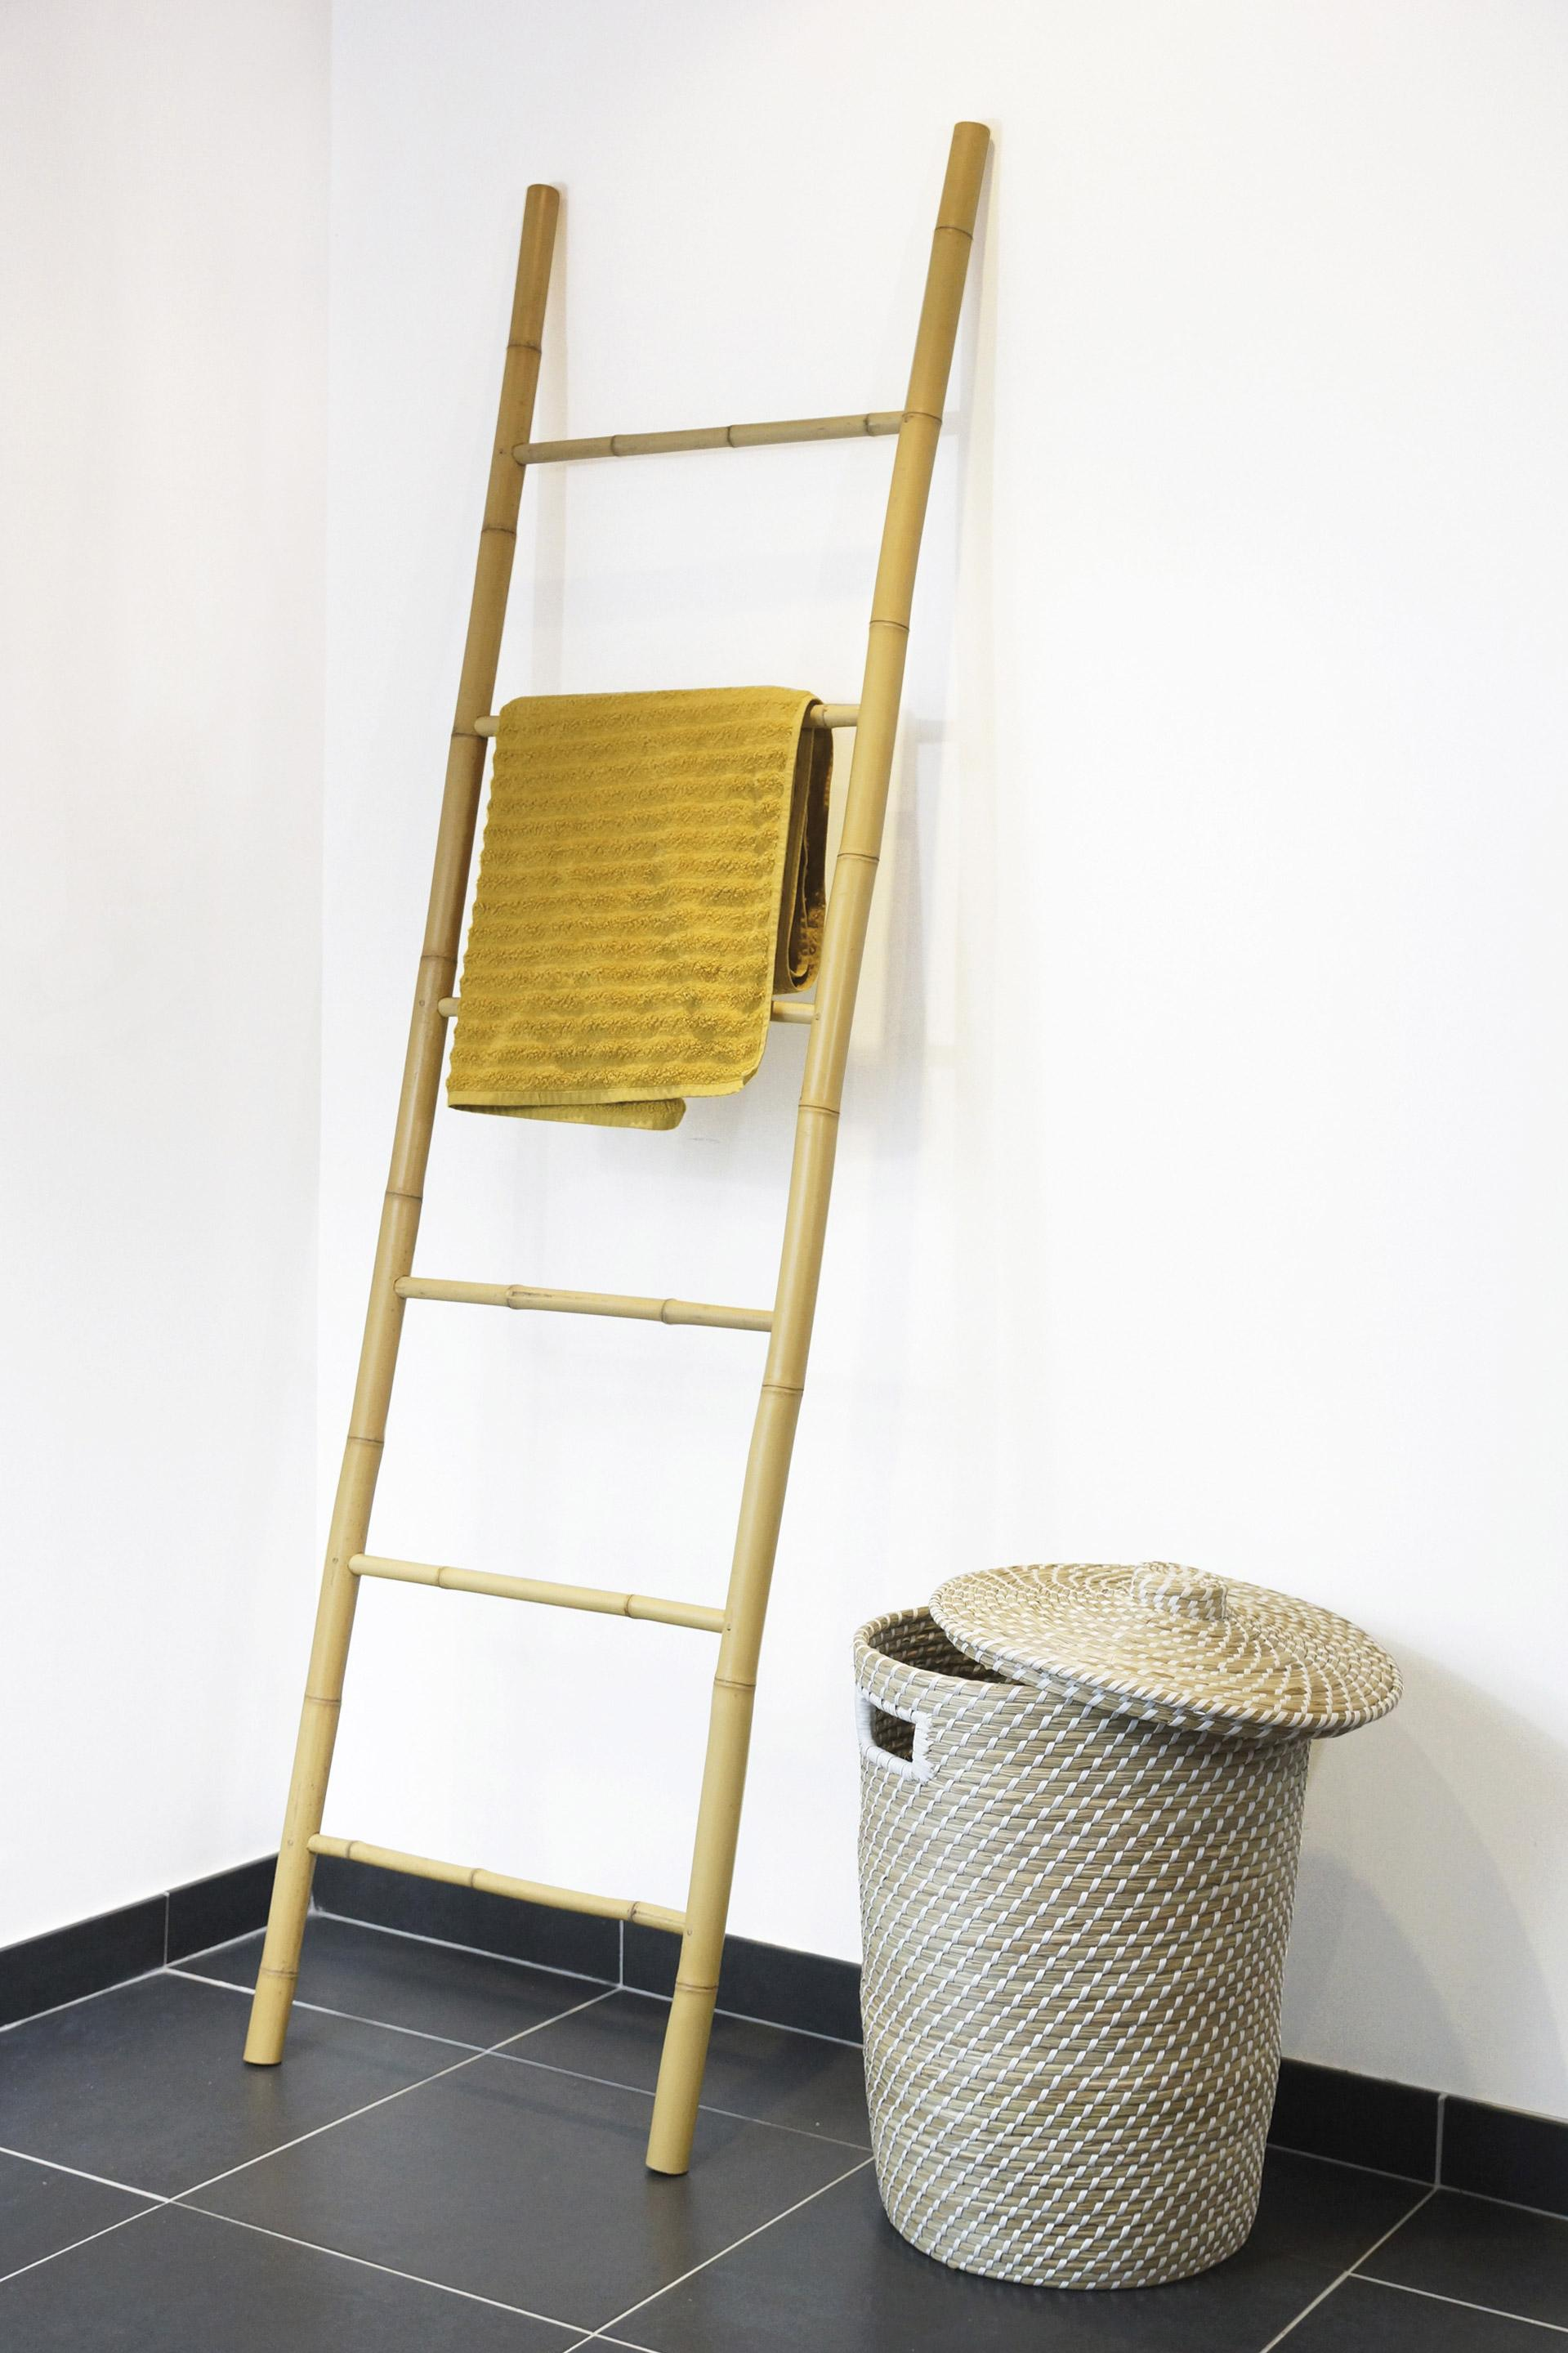 echelle bambou salle de bain leroy merlin Porte-serviettes à poser, Bambou ...